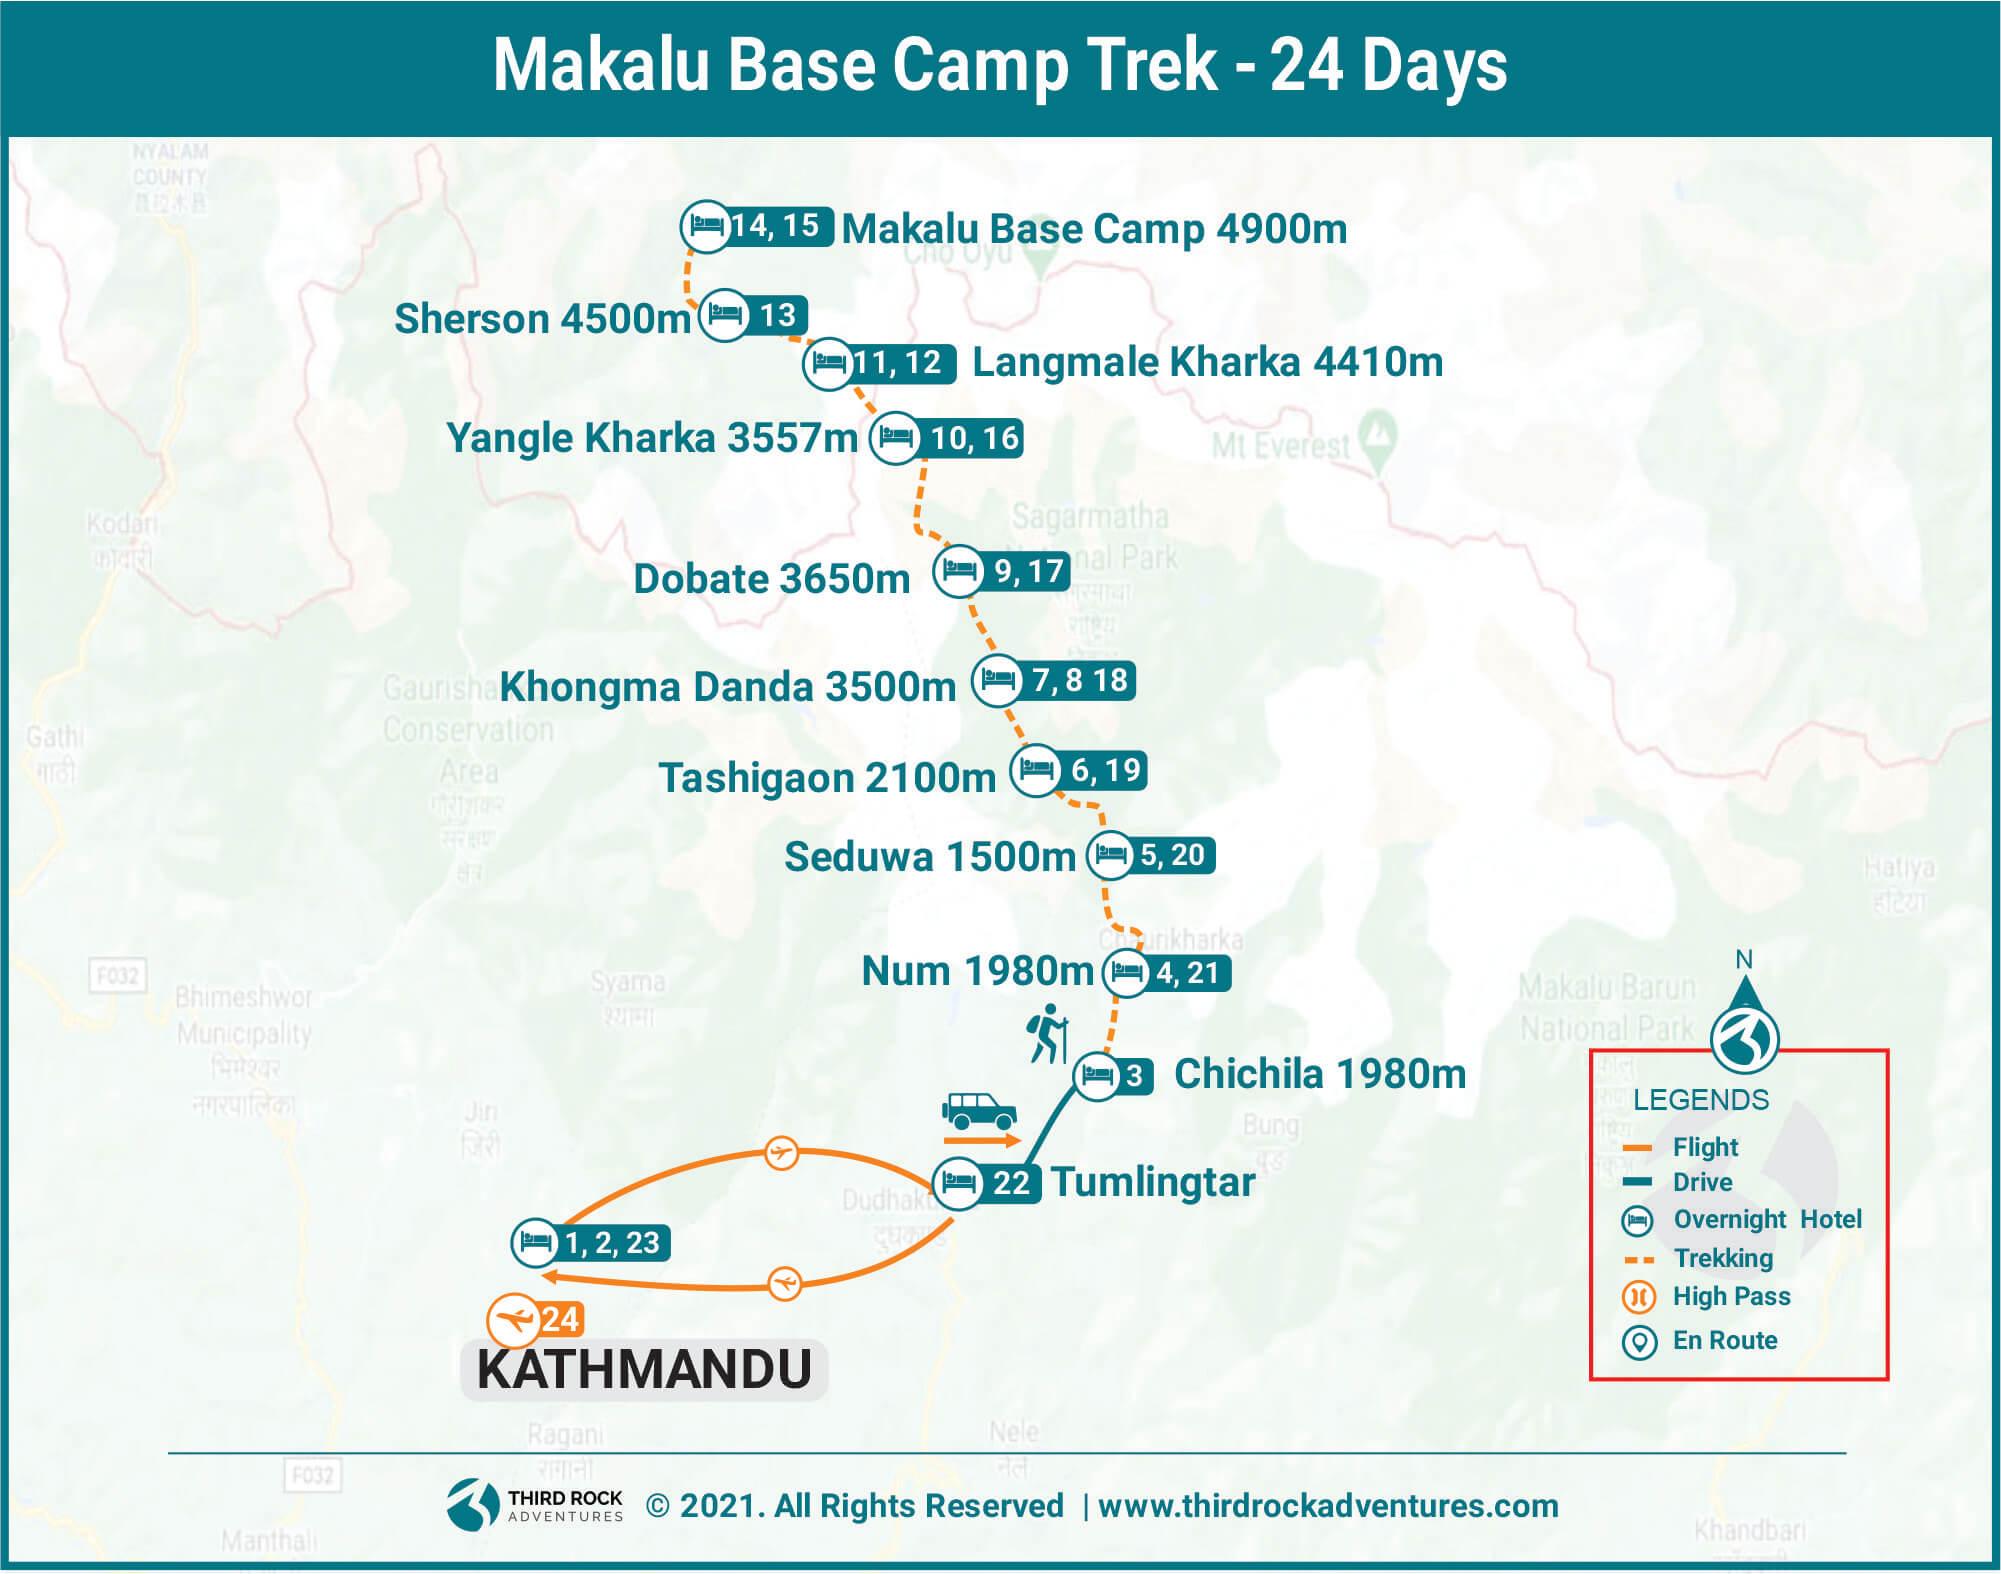 Makalu Base Camp Trek Route Map